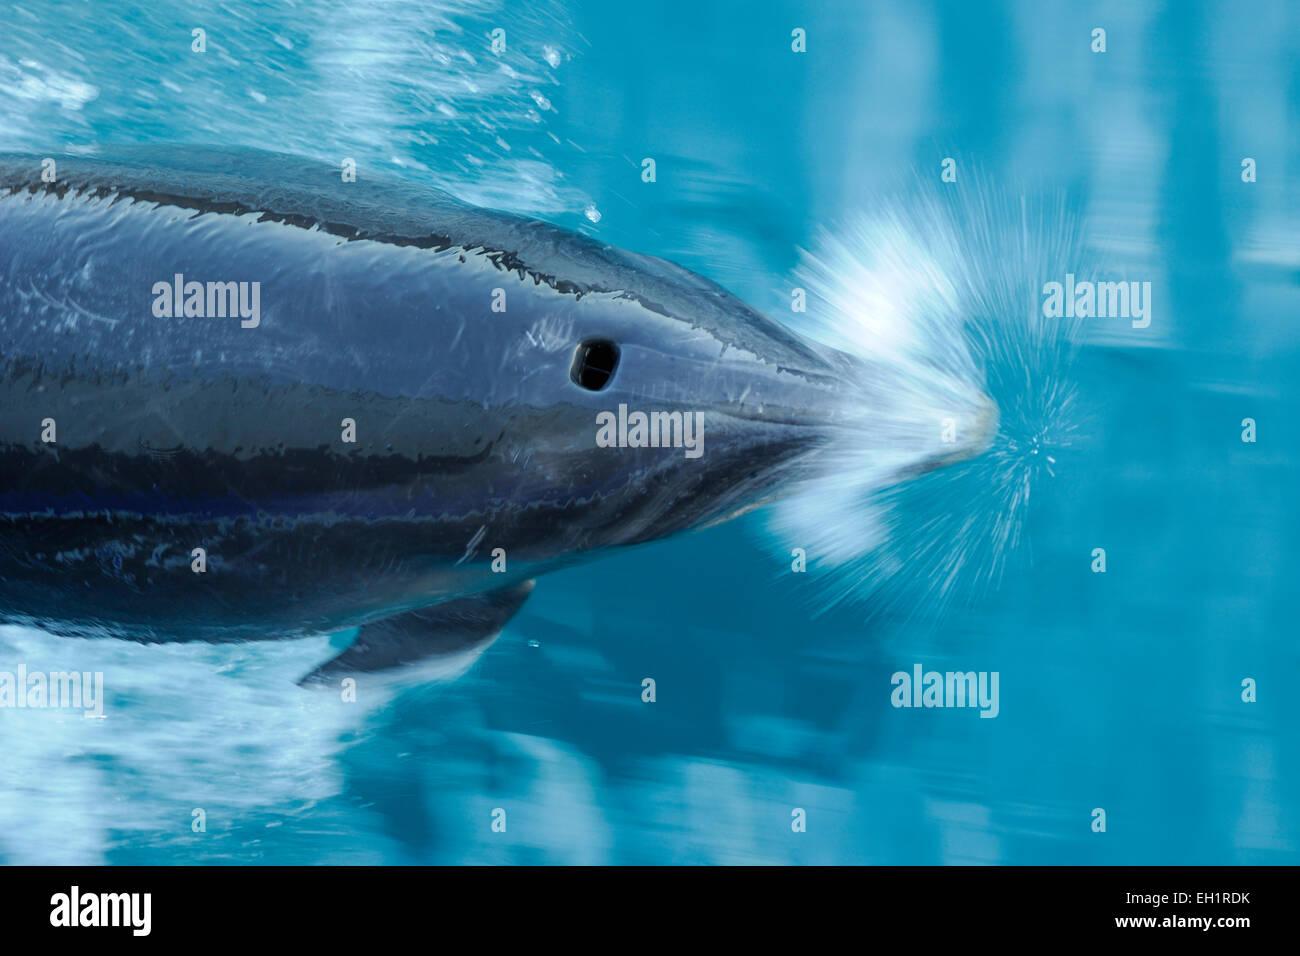 Bottlenose dolphins (Tursiops truncatus) Marlborough Sounds, New Zealand [size of single organism: 3 m]   Große - Stock Image